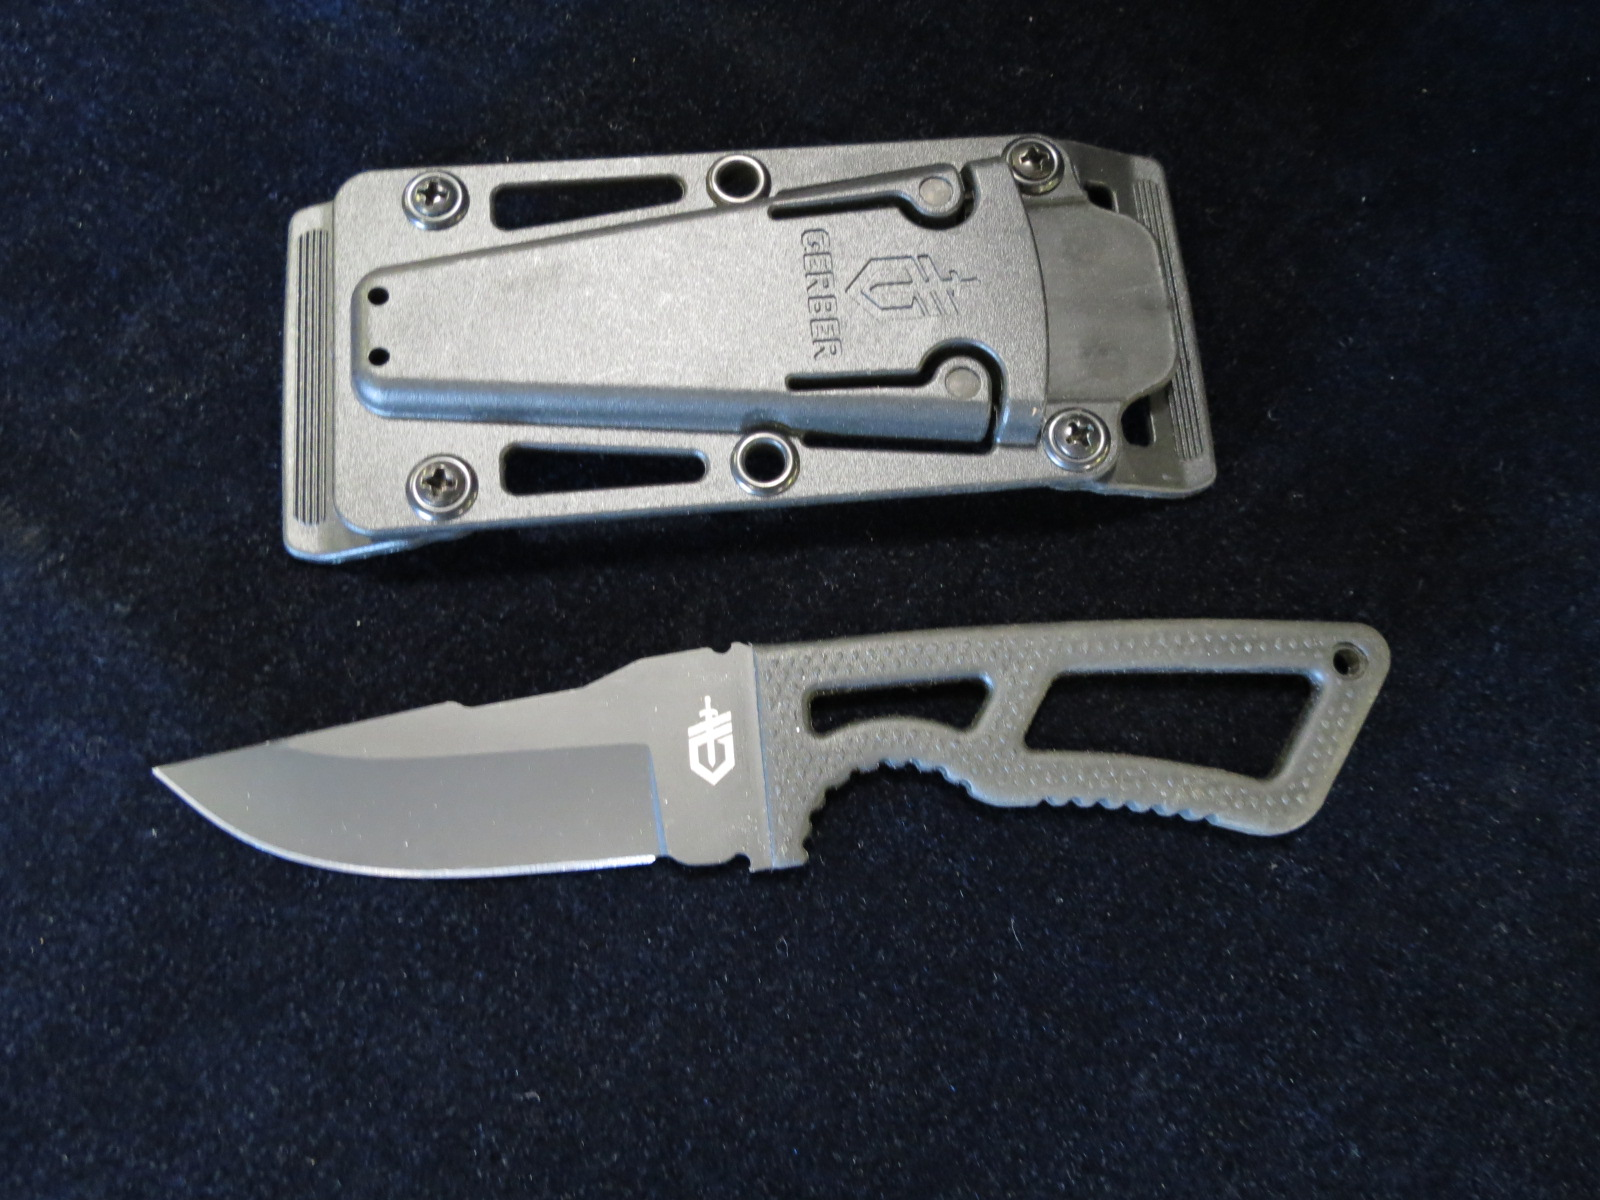 Gerber Fixed Blade Knives